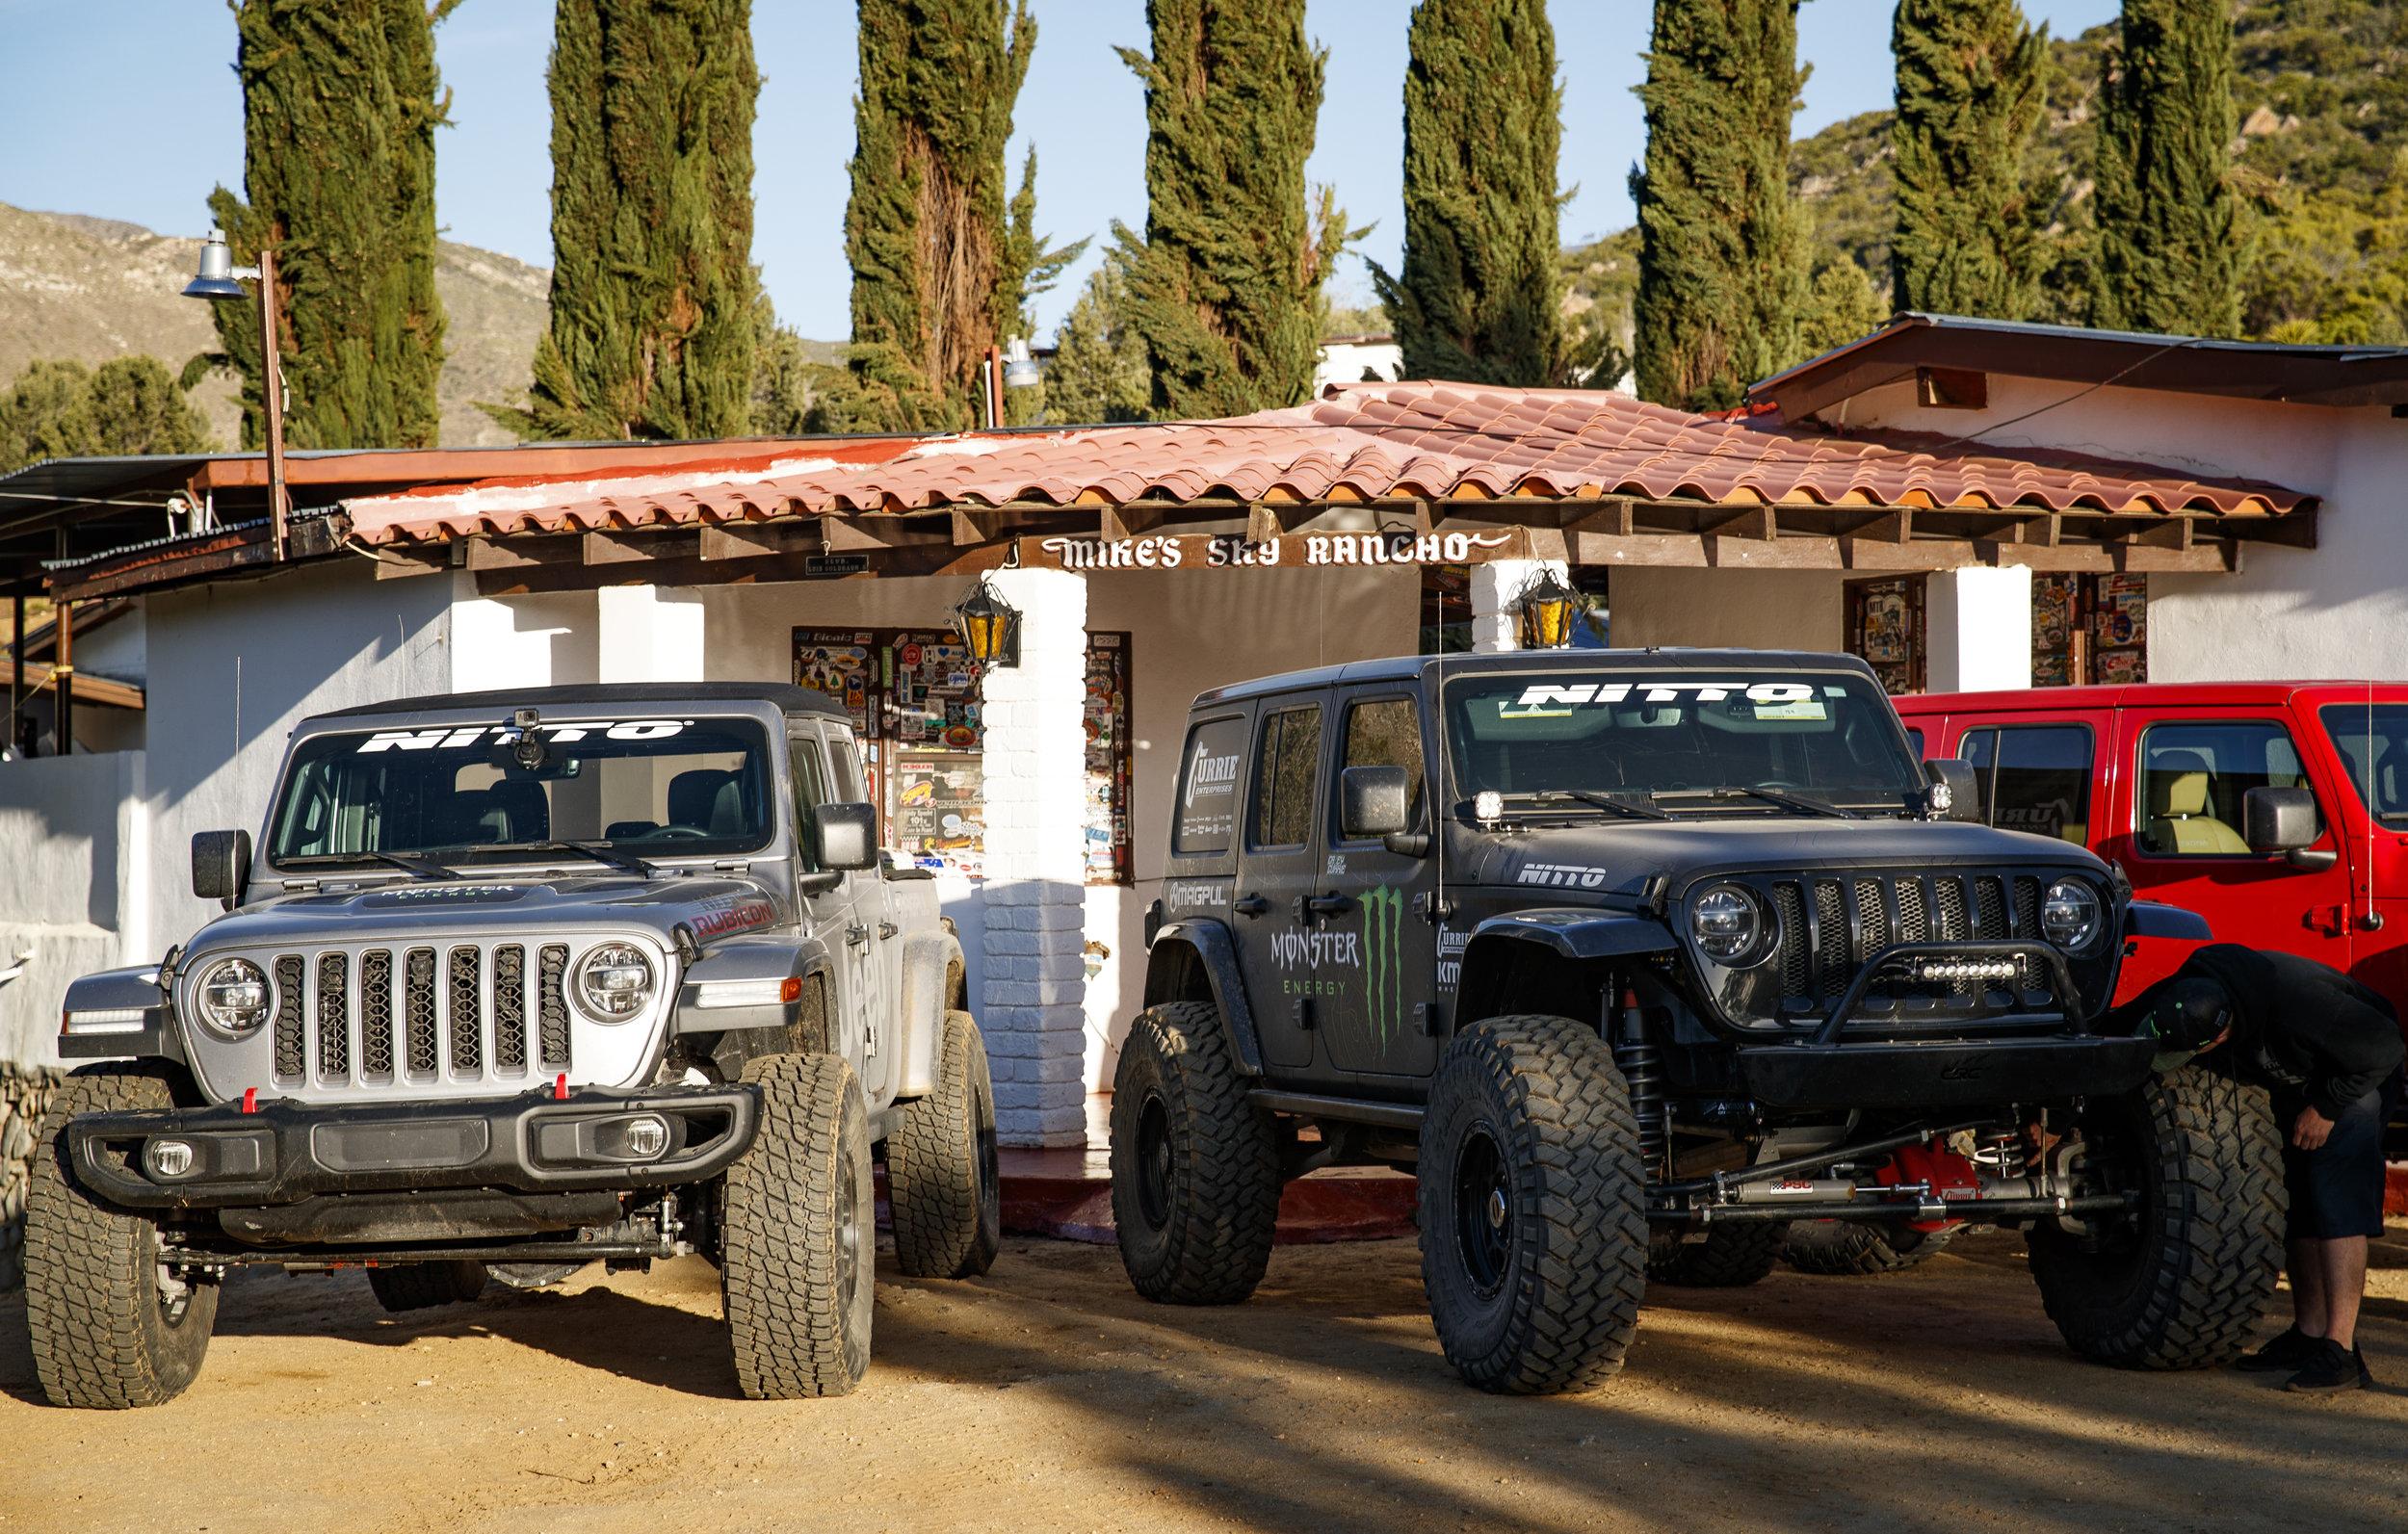 6_24_CaseyCurrie_Baja500PreRunning_BajaMexico_Jeep_006.jpg